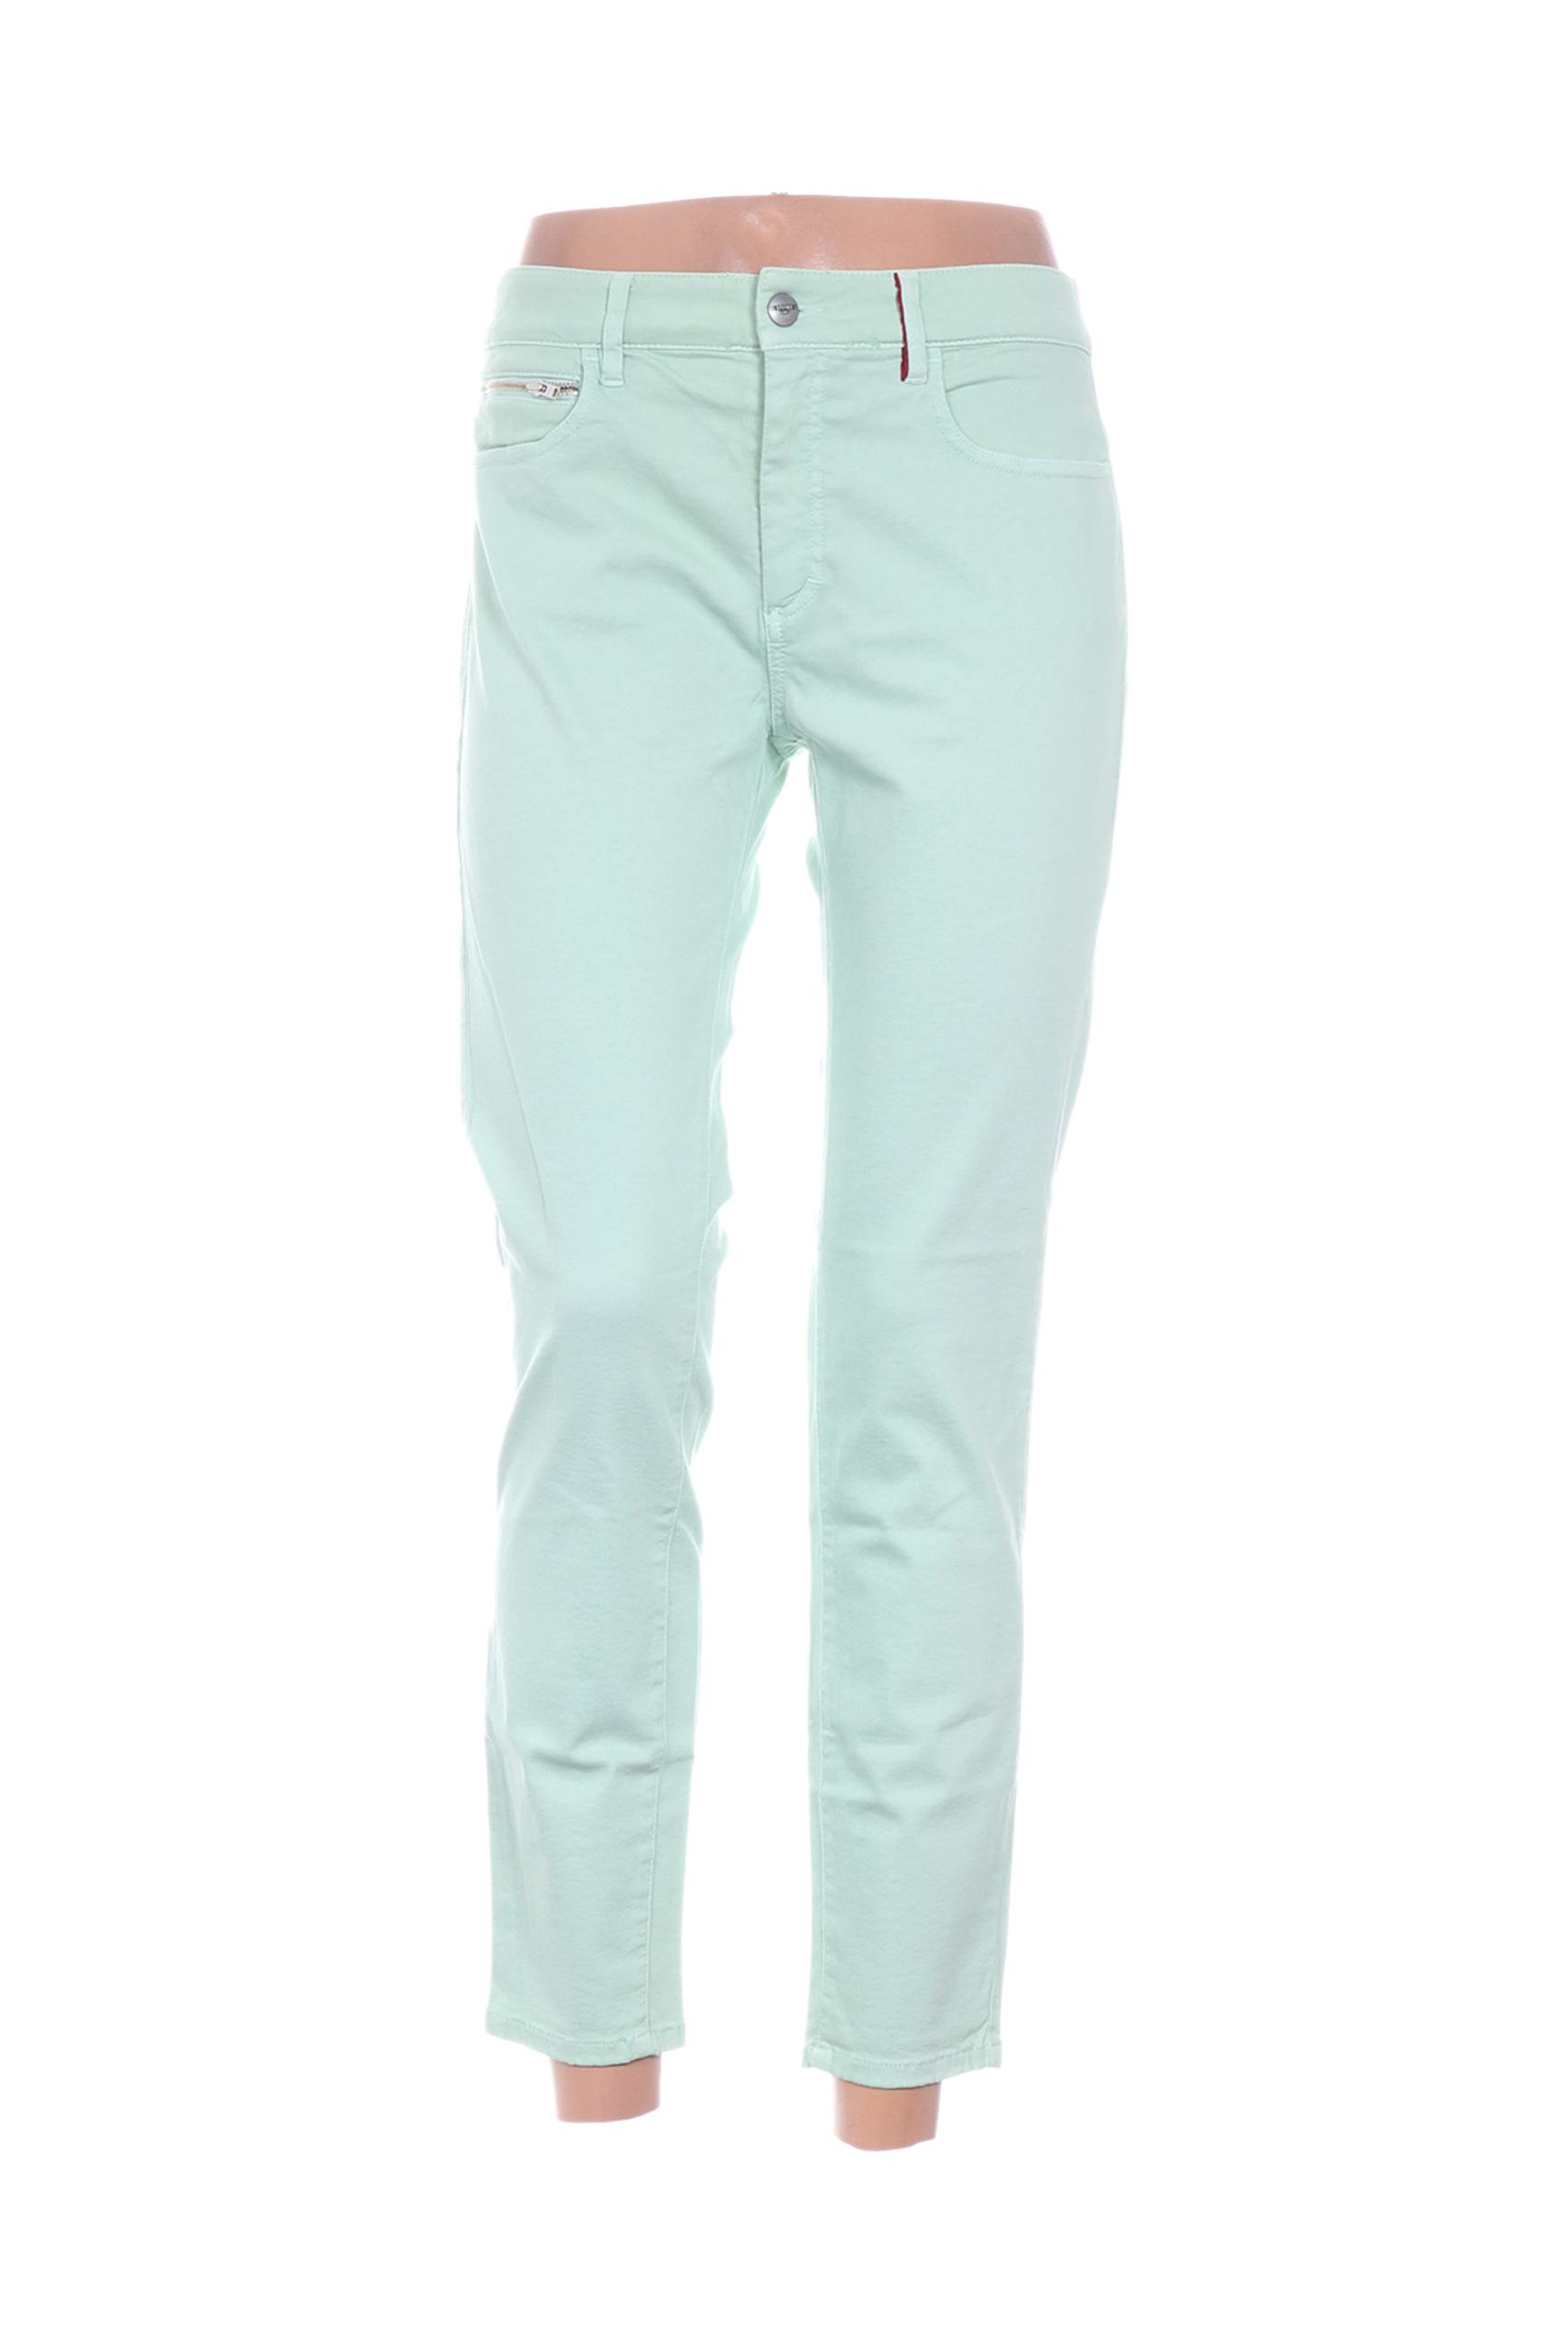 Pantalon 7/8 femme Couturist vert taille : W34 26 FR (FR)